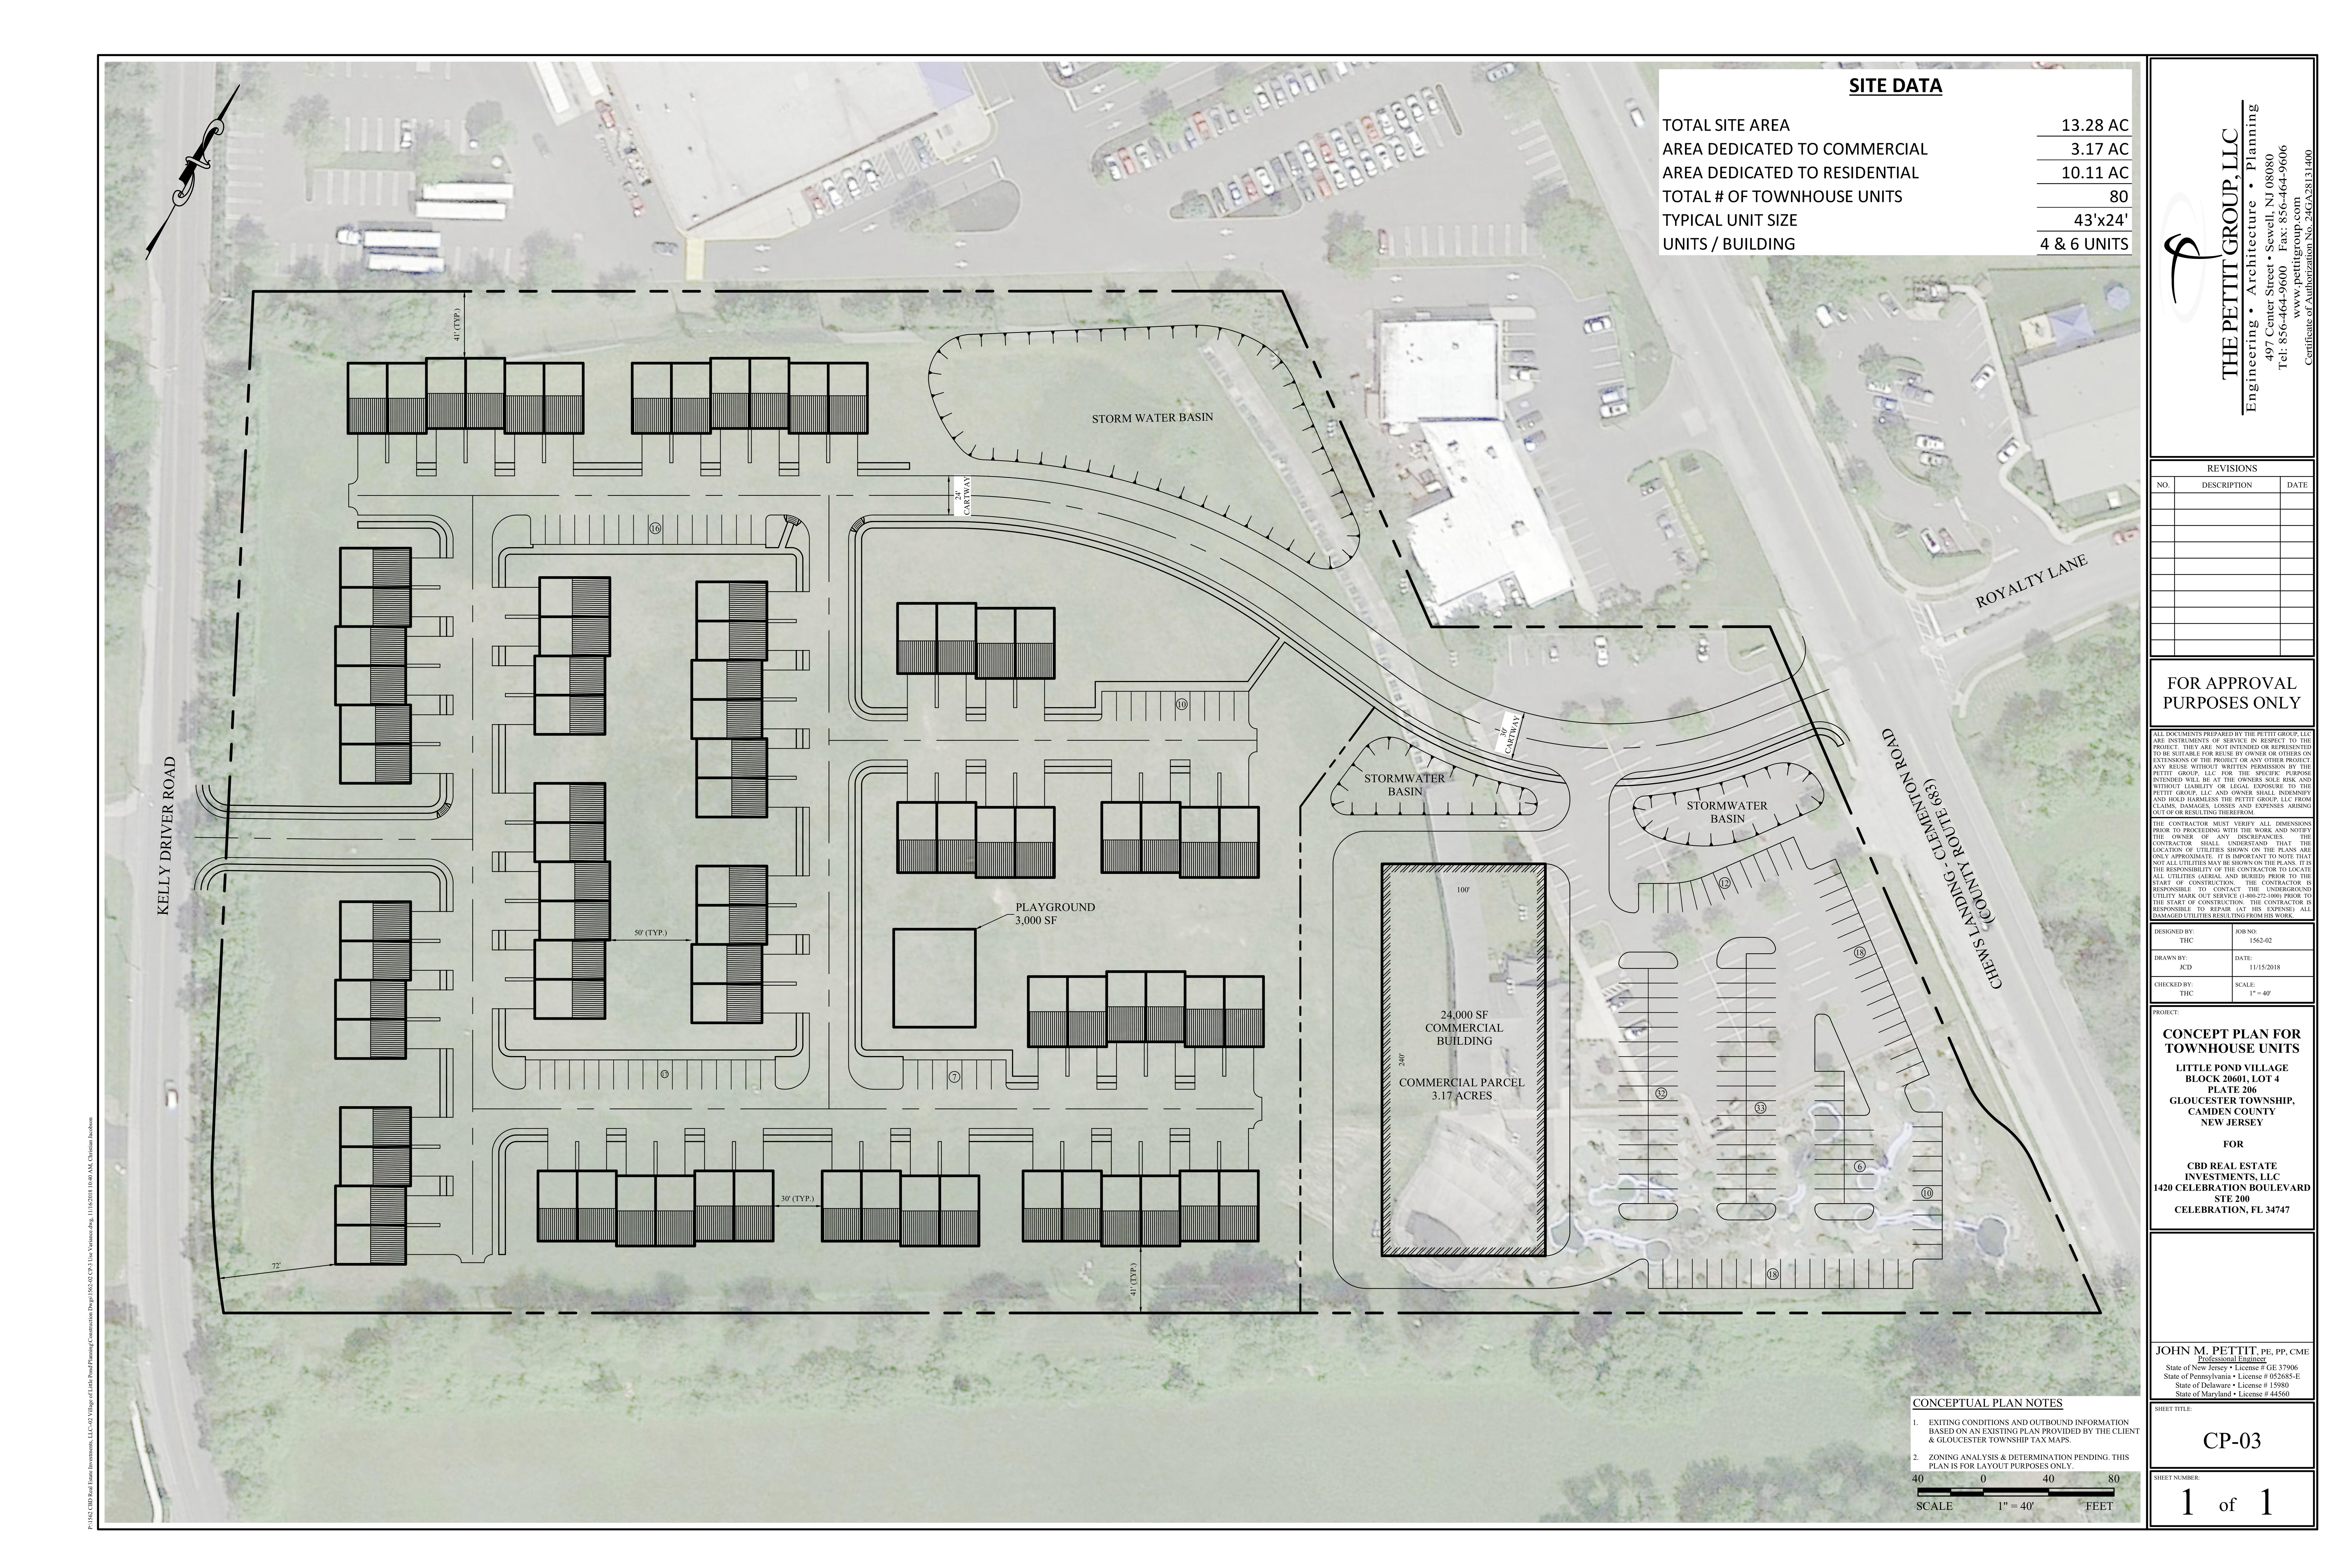 Little Pond Site Plan